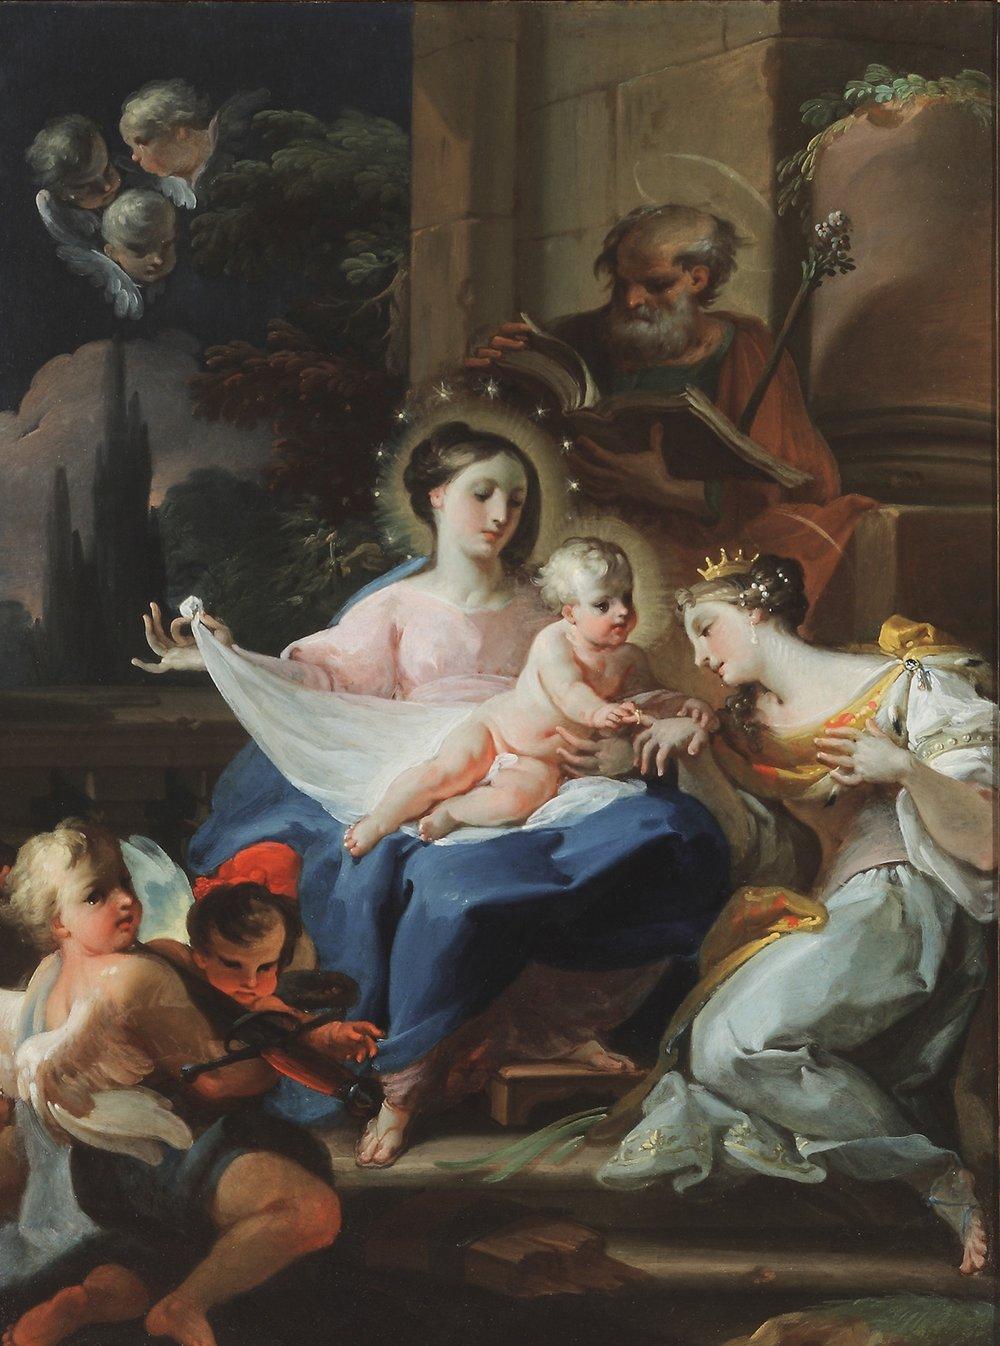 CORRADO GIAQUINTO The Mystic Marriage of St. Catherine of Alexandria